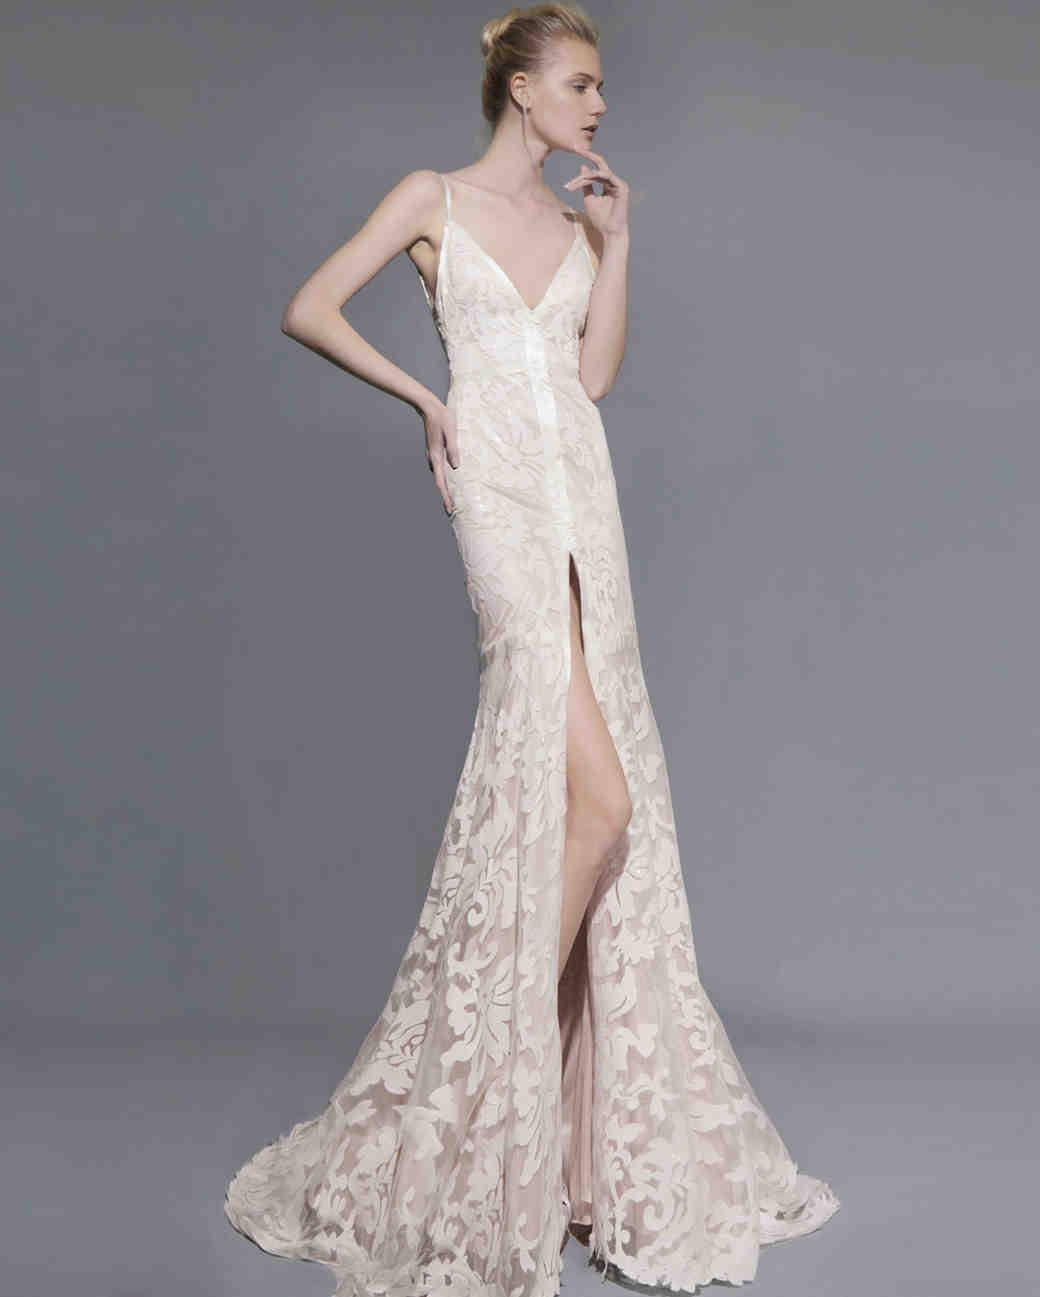 50-states-wedding-dresses-wisconsin-victoria-kriyakedes-0615.jpg